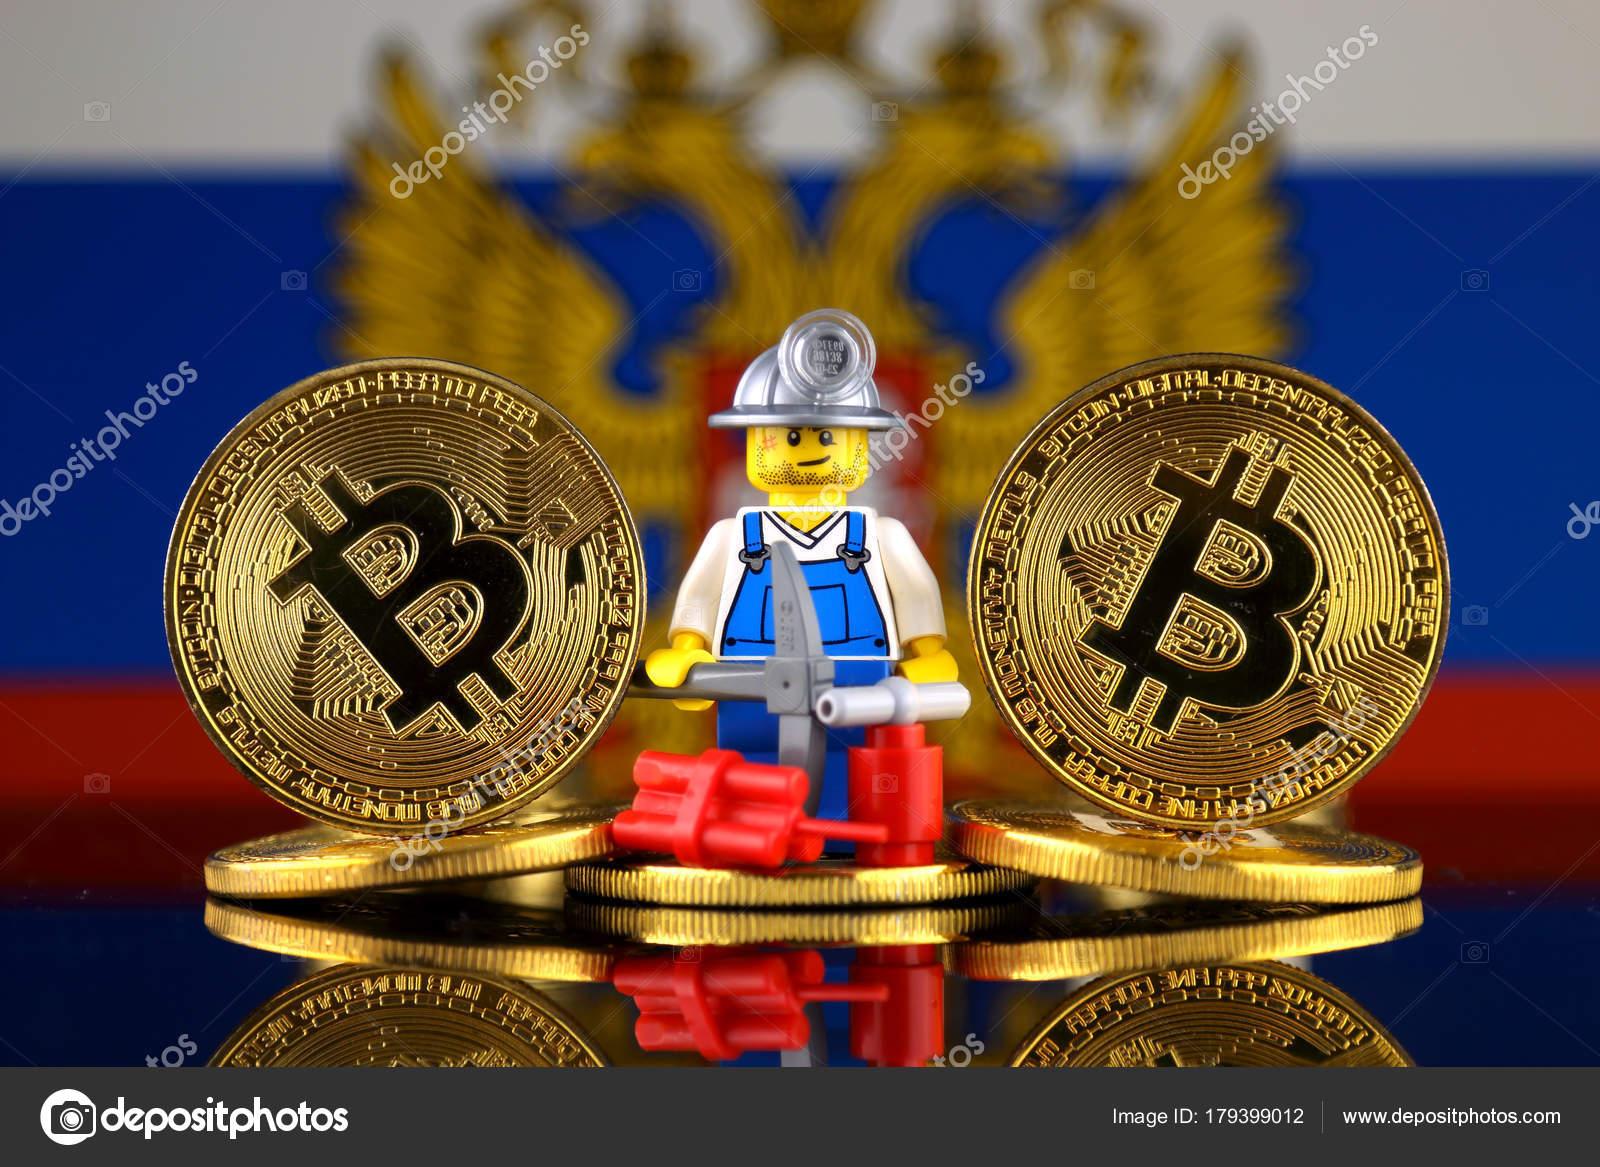 Verso fsica bitcoin mineiro bandeira rssia imagem conceitual verso fsica bitcoin mineiro bandeira rssia imagem conceitual minerao cryptocurrency fotografia de stock ccuart Choice Image